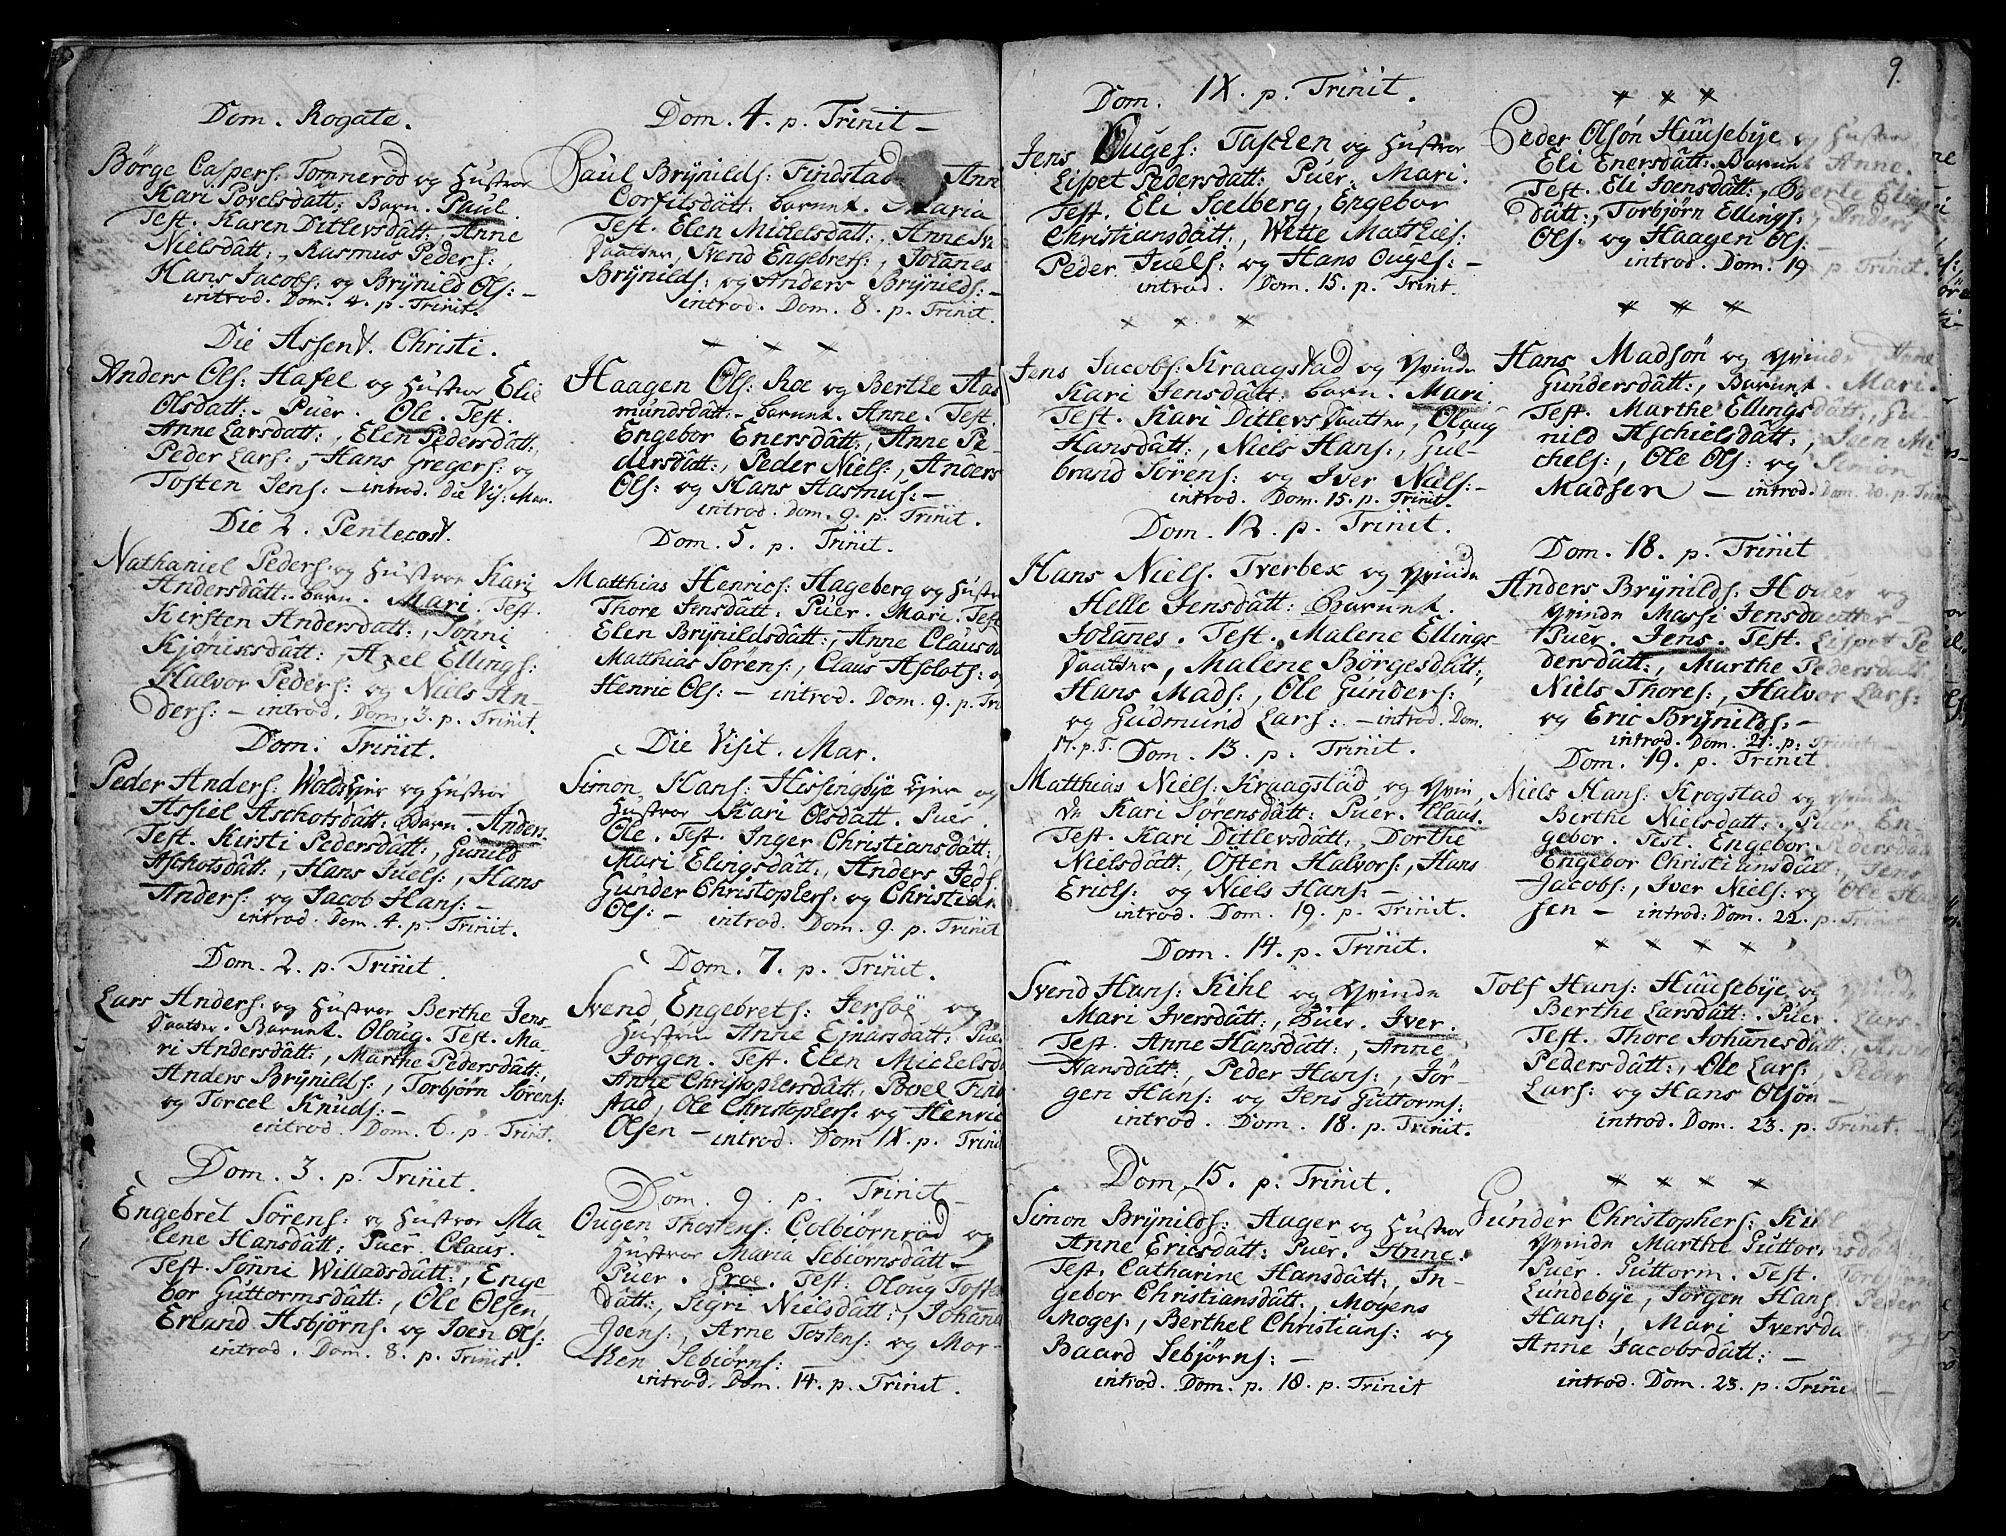 SAO, Råde prestekontor kirkebøker, F/Fa/L0002: Ministerialbok nr. 2, 1762-1806, s. 9